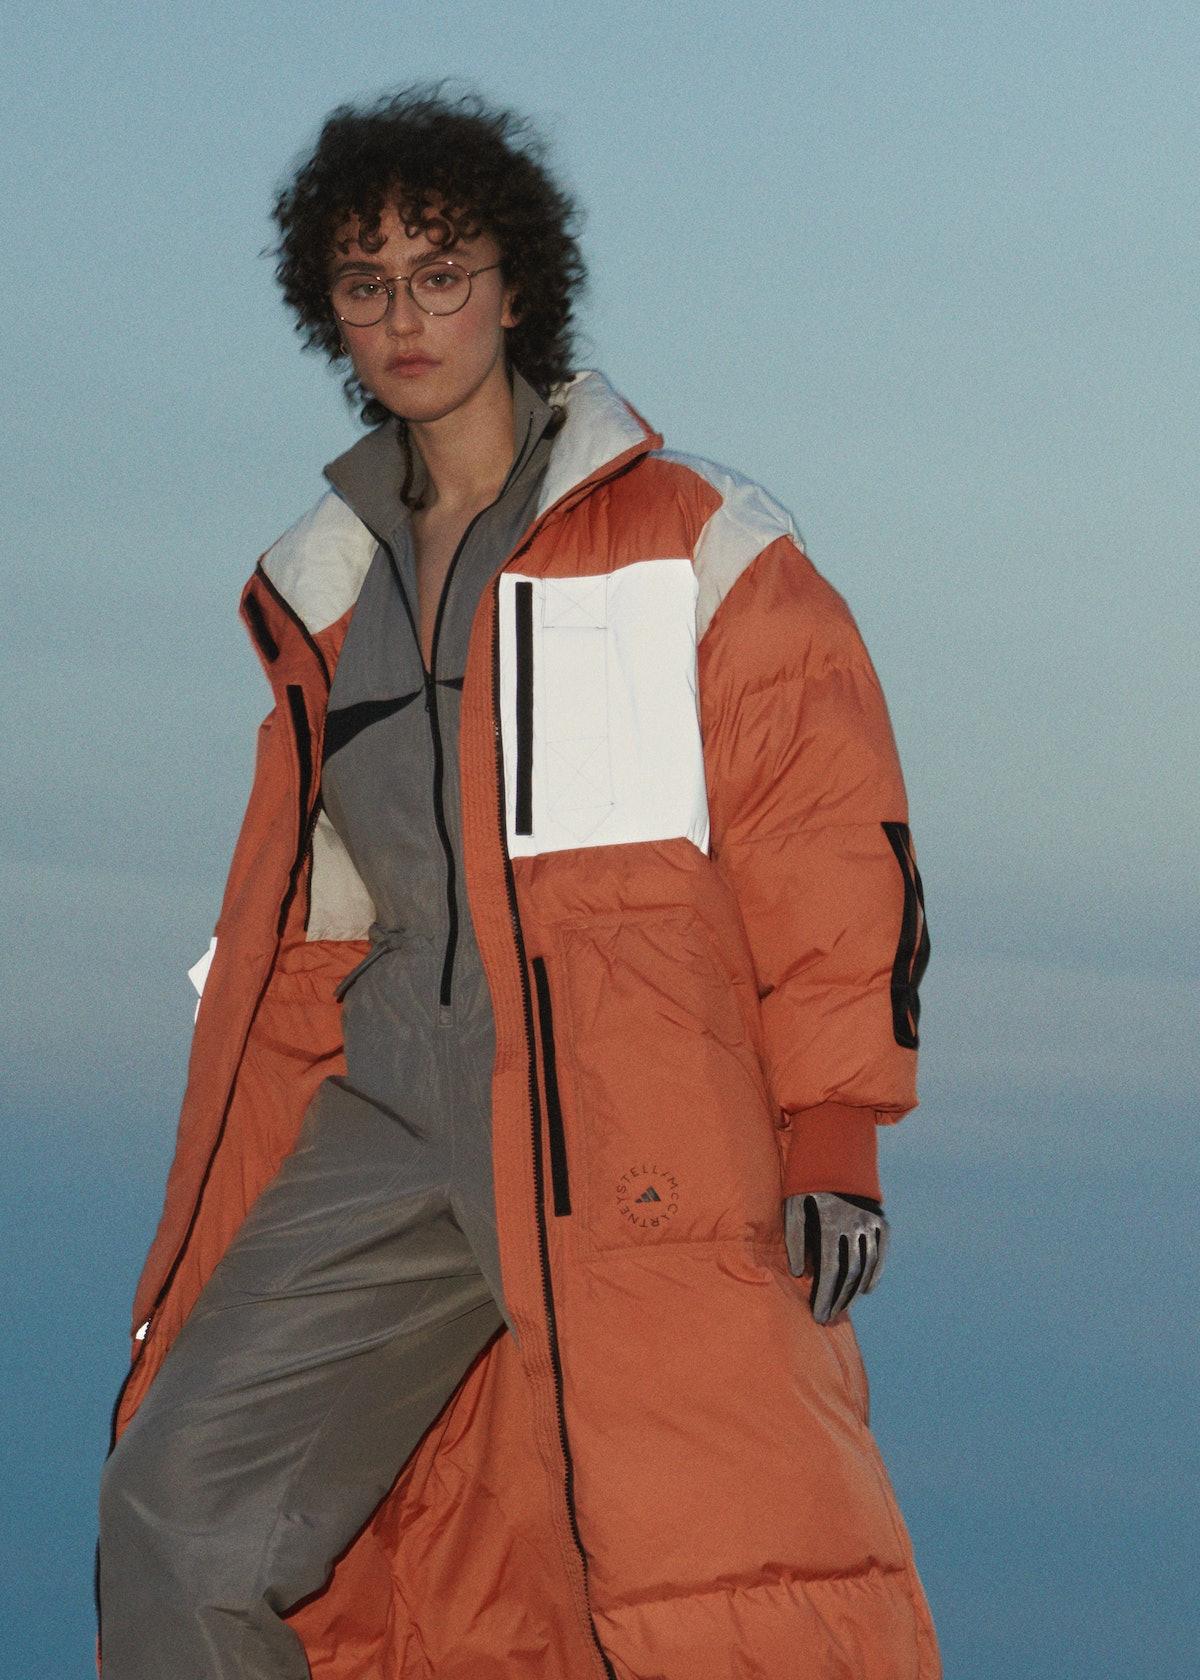 Ella Emhoff models for adidas by Stella McCartney Fall/Winter 2021 campaign.